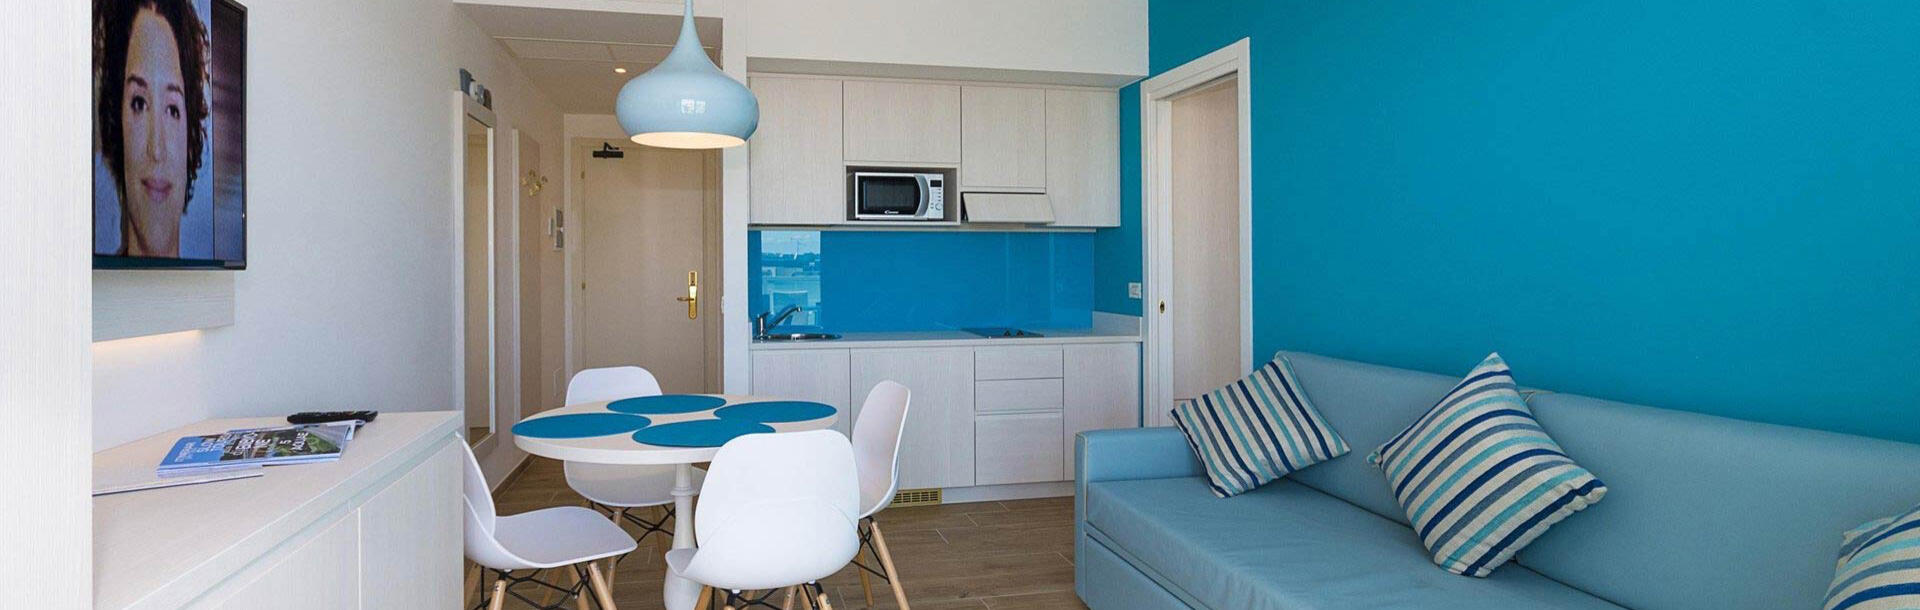 hotel-montecarlo de family-living-suite-bibione 013